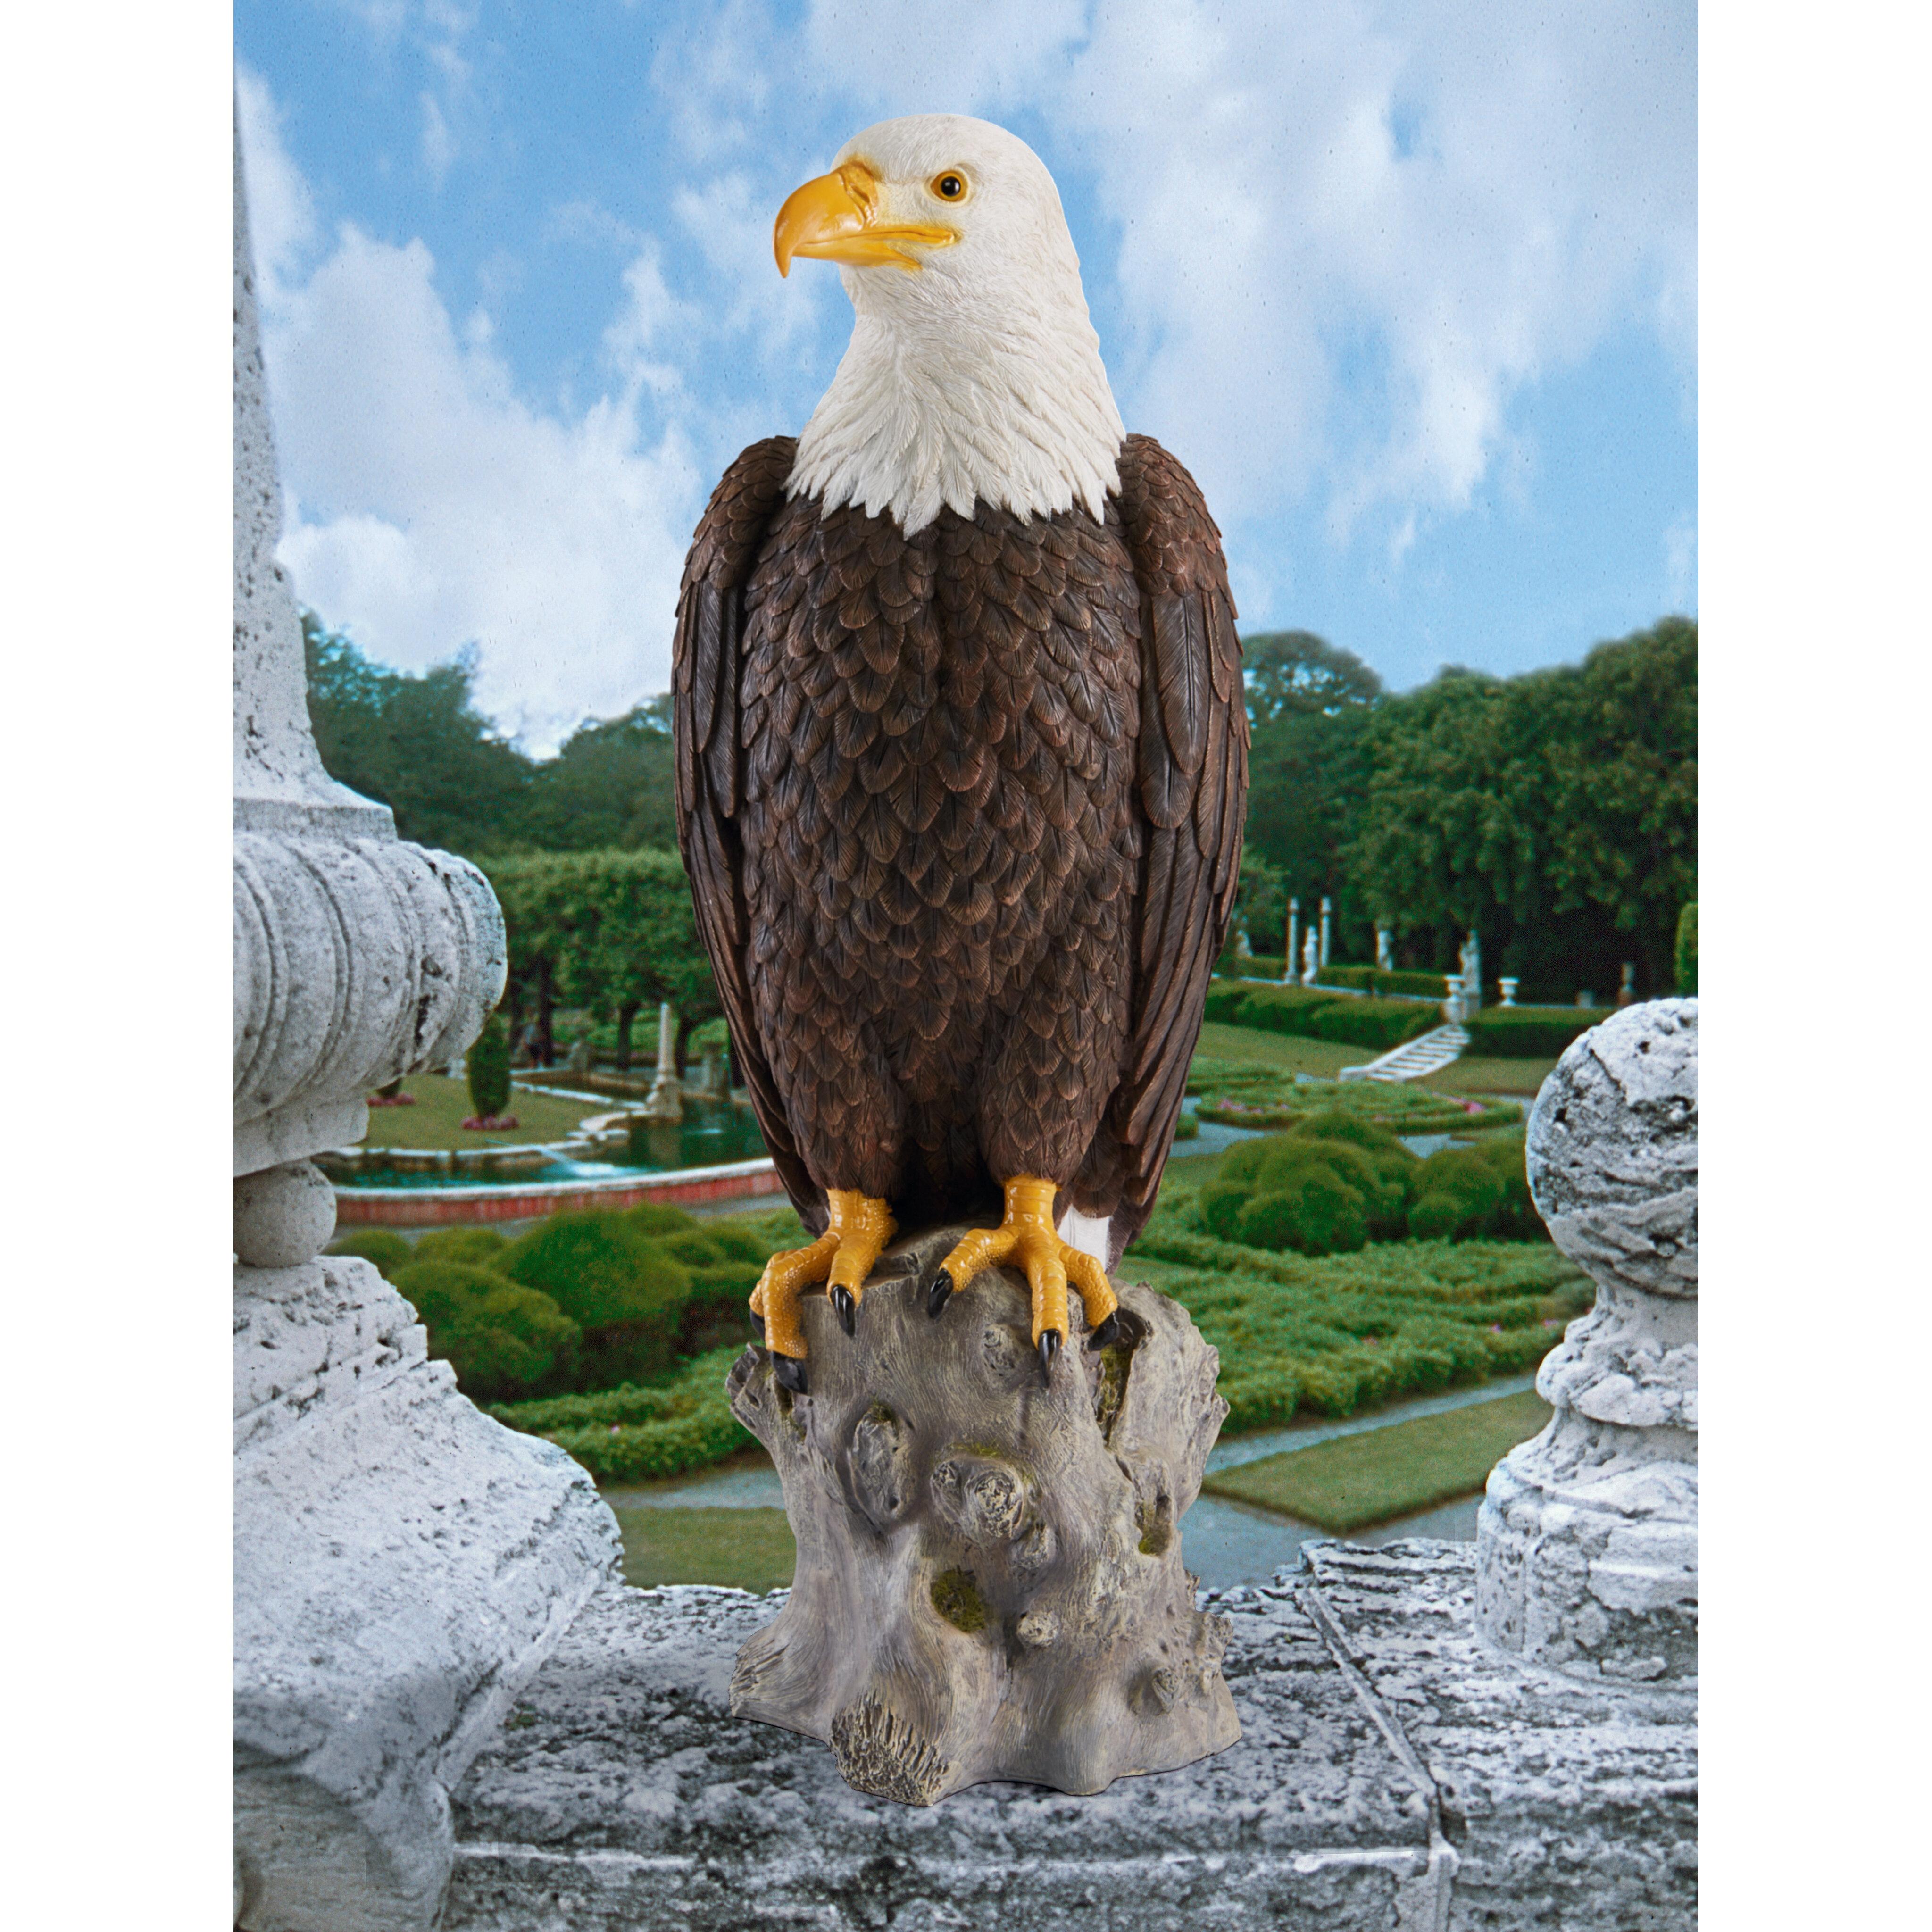 Design Toscano Majestic Mountain Eagle Garden Statue U0026 Reviews | Wayfair